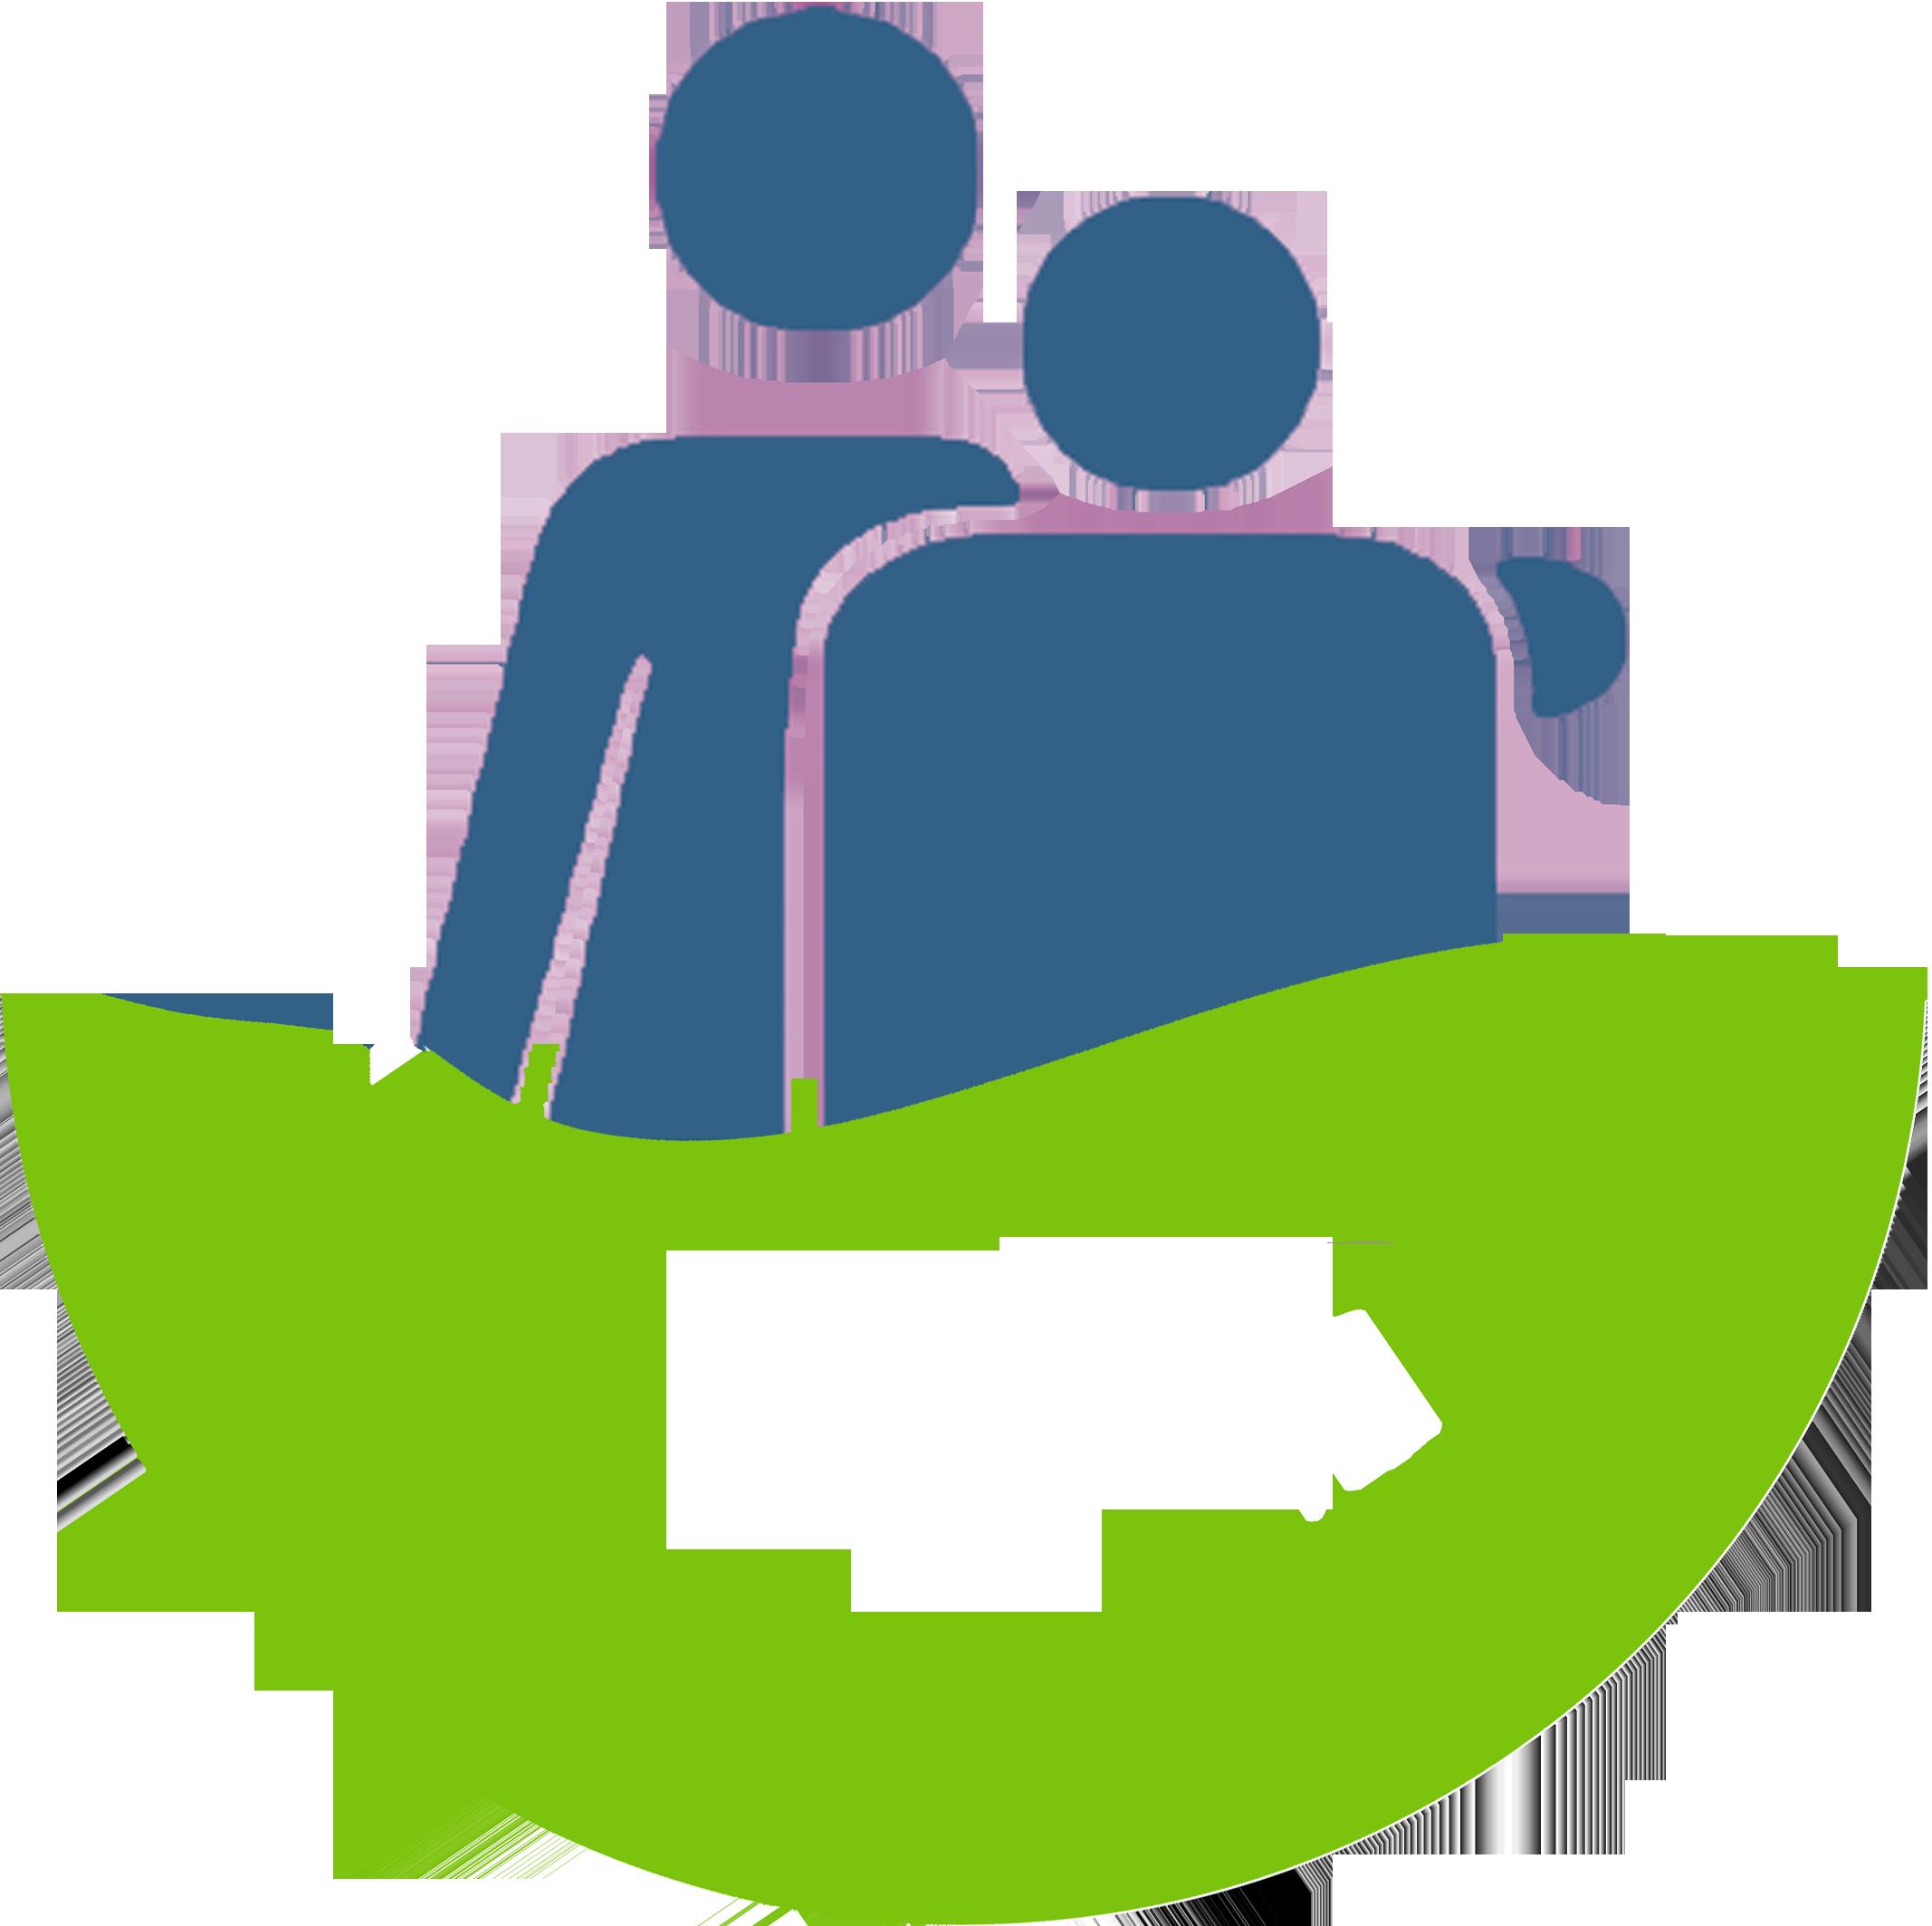 Health clipart health symbol. Home care collection senior